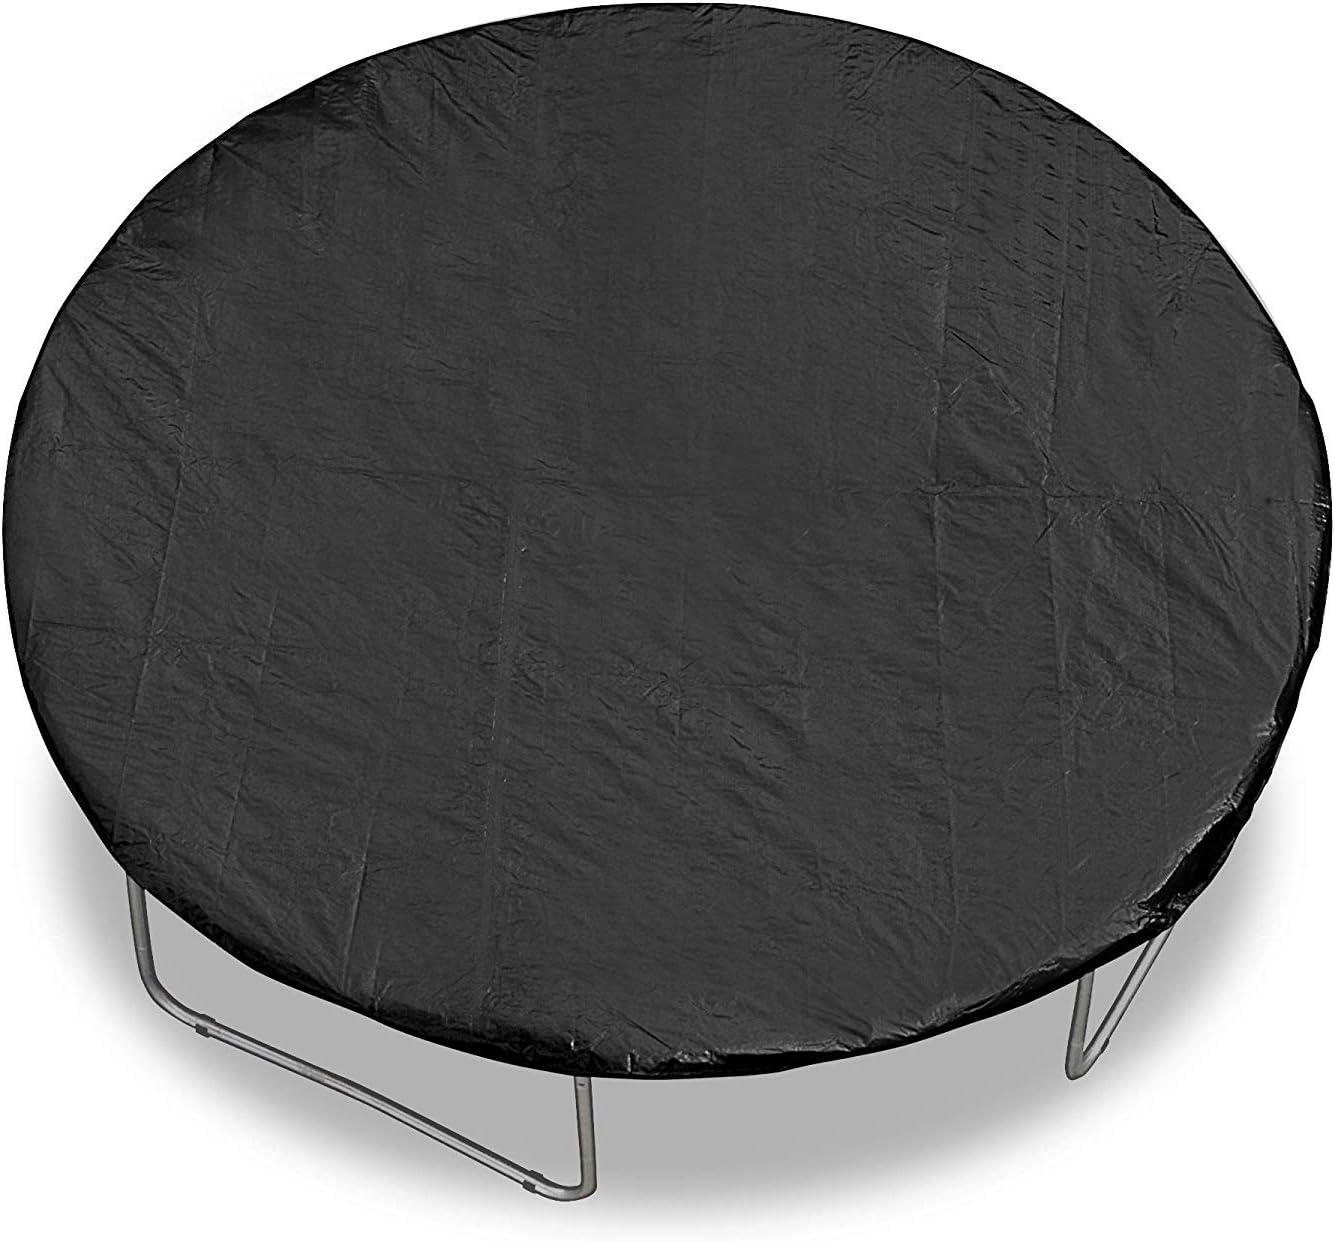 14FT Trampoline Weather Rain Dust Cover Black Waterproof Outdoor